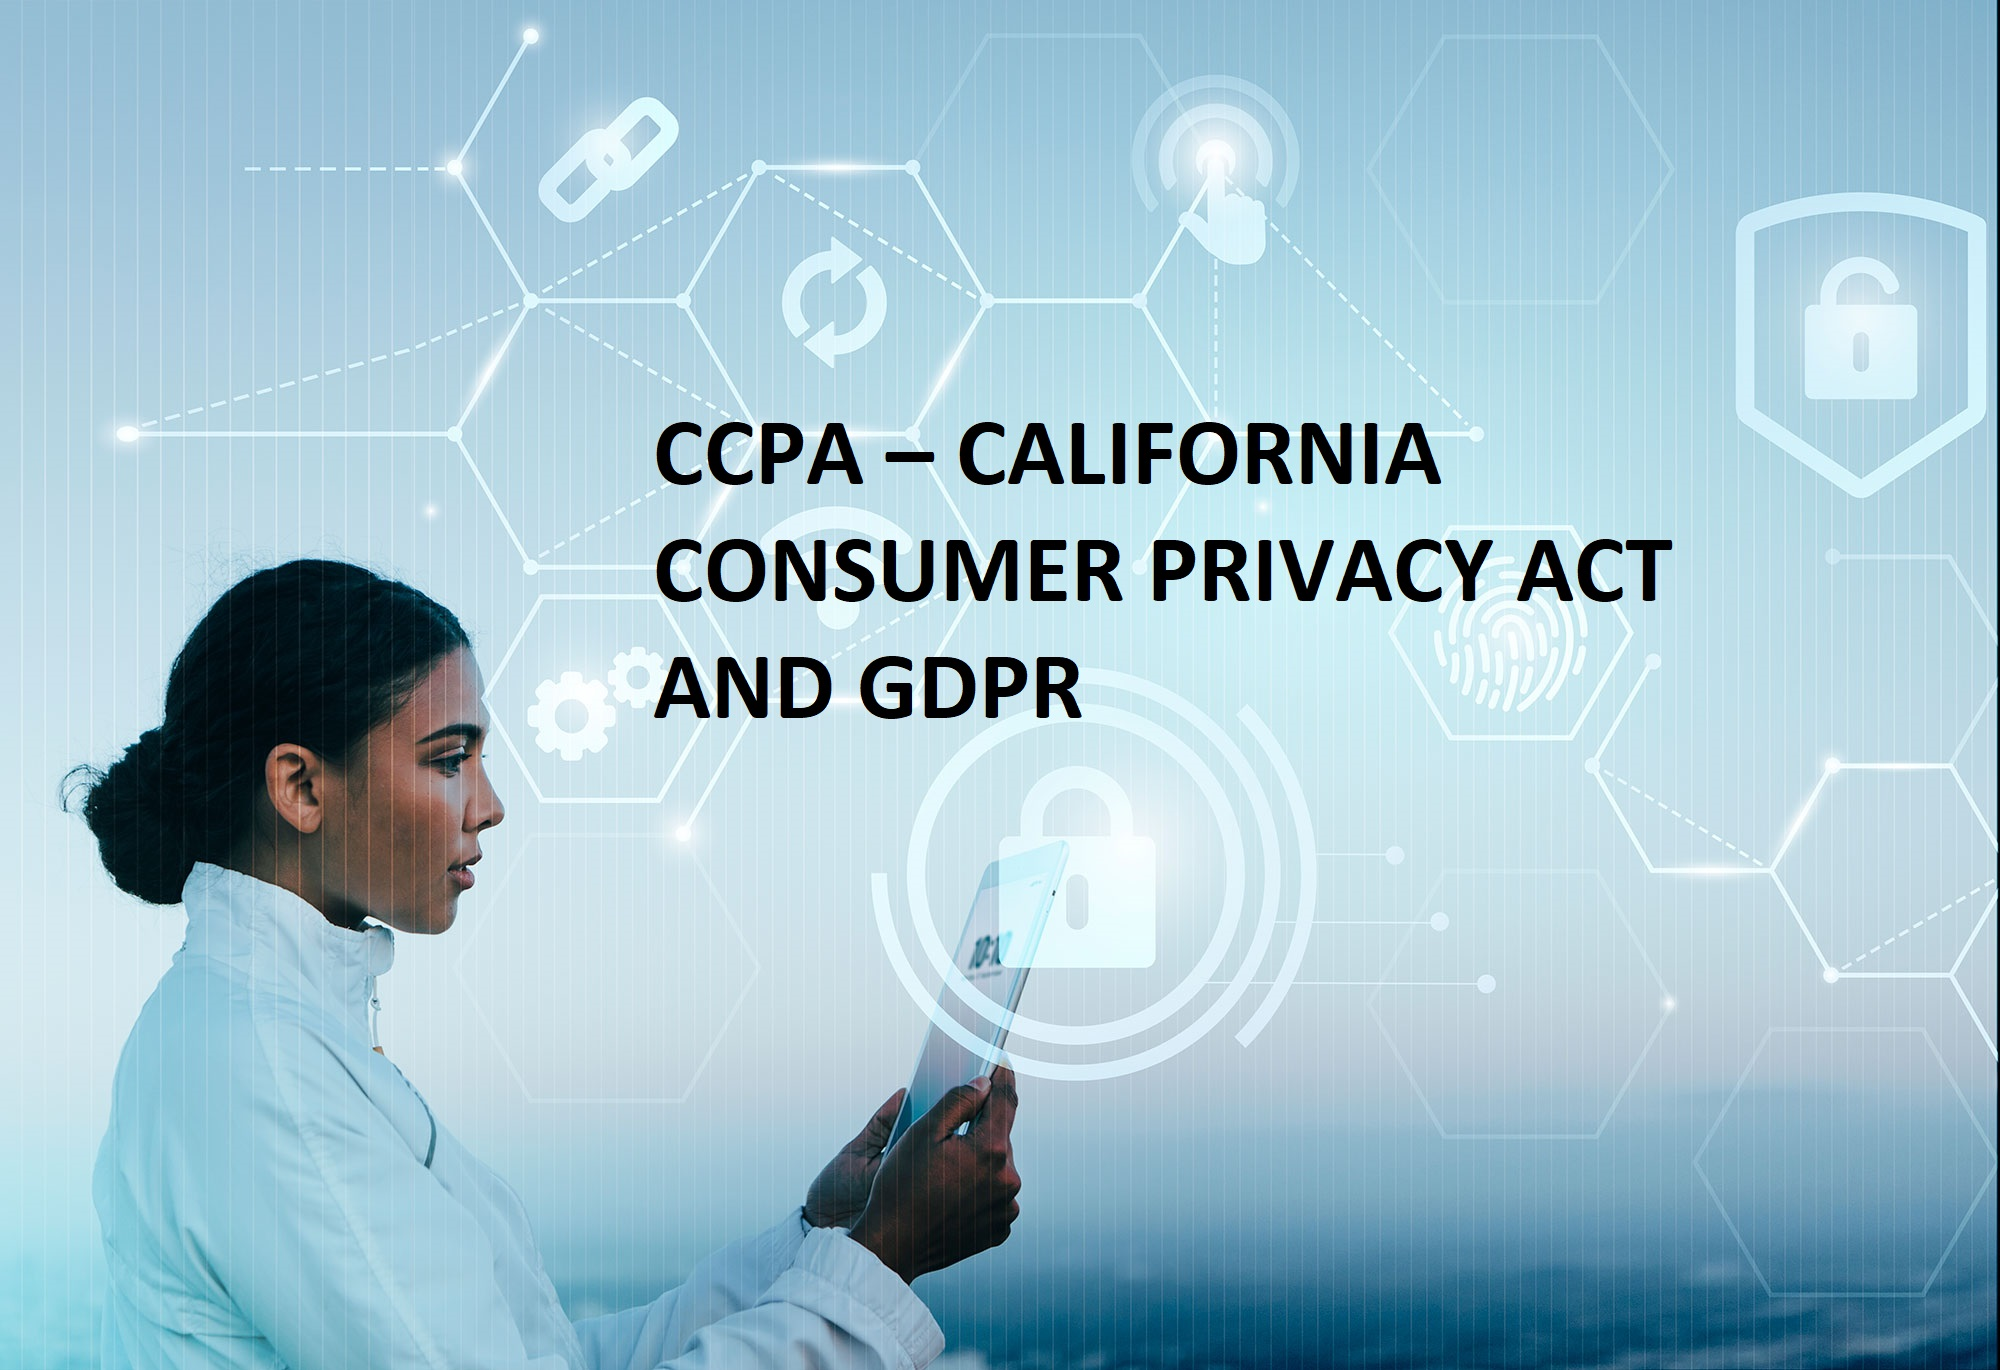 CCPA – California Consumer Privacy Act and GDPR